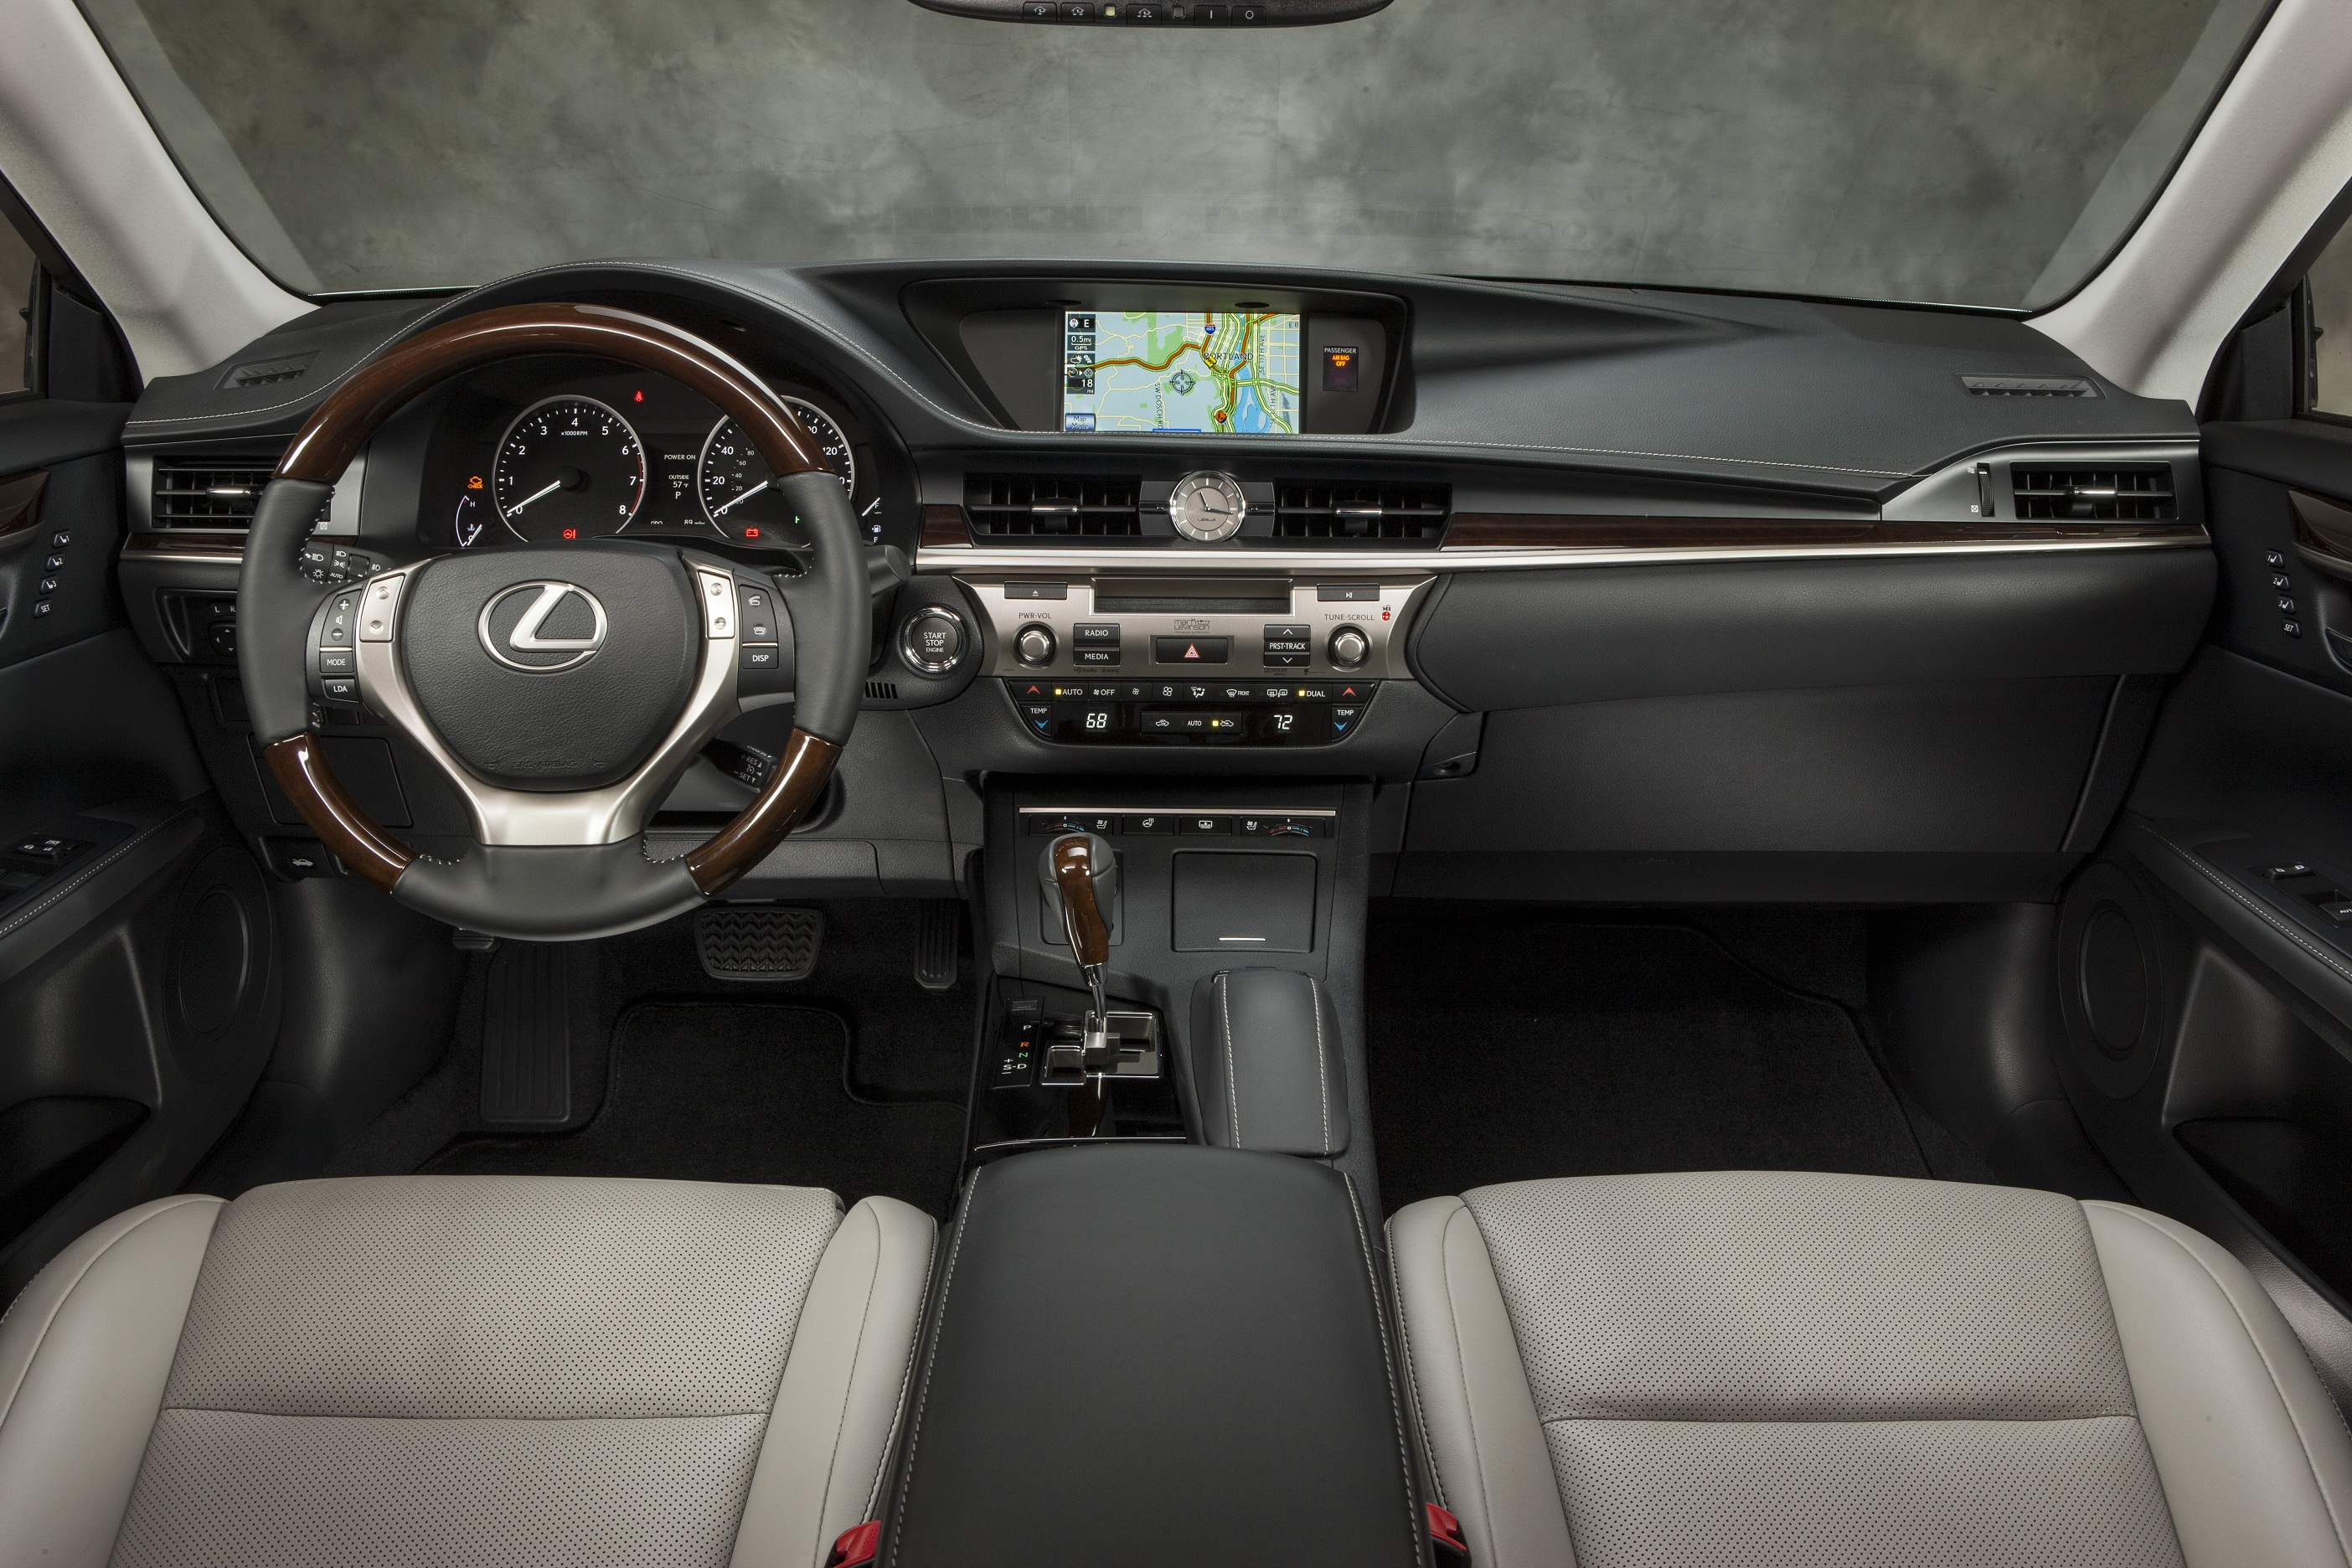 gs experience weekend amazing with lexus sedan hybrid the drive black